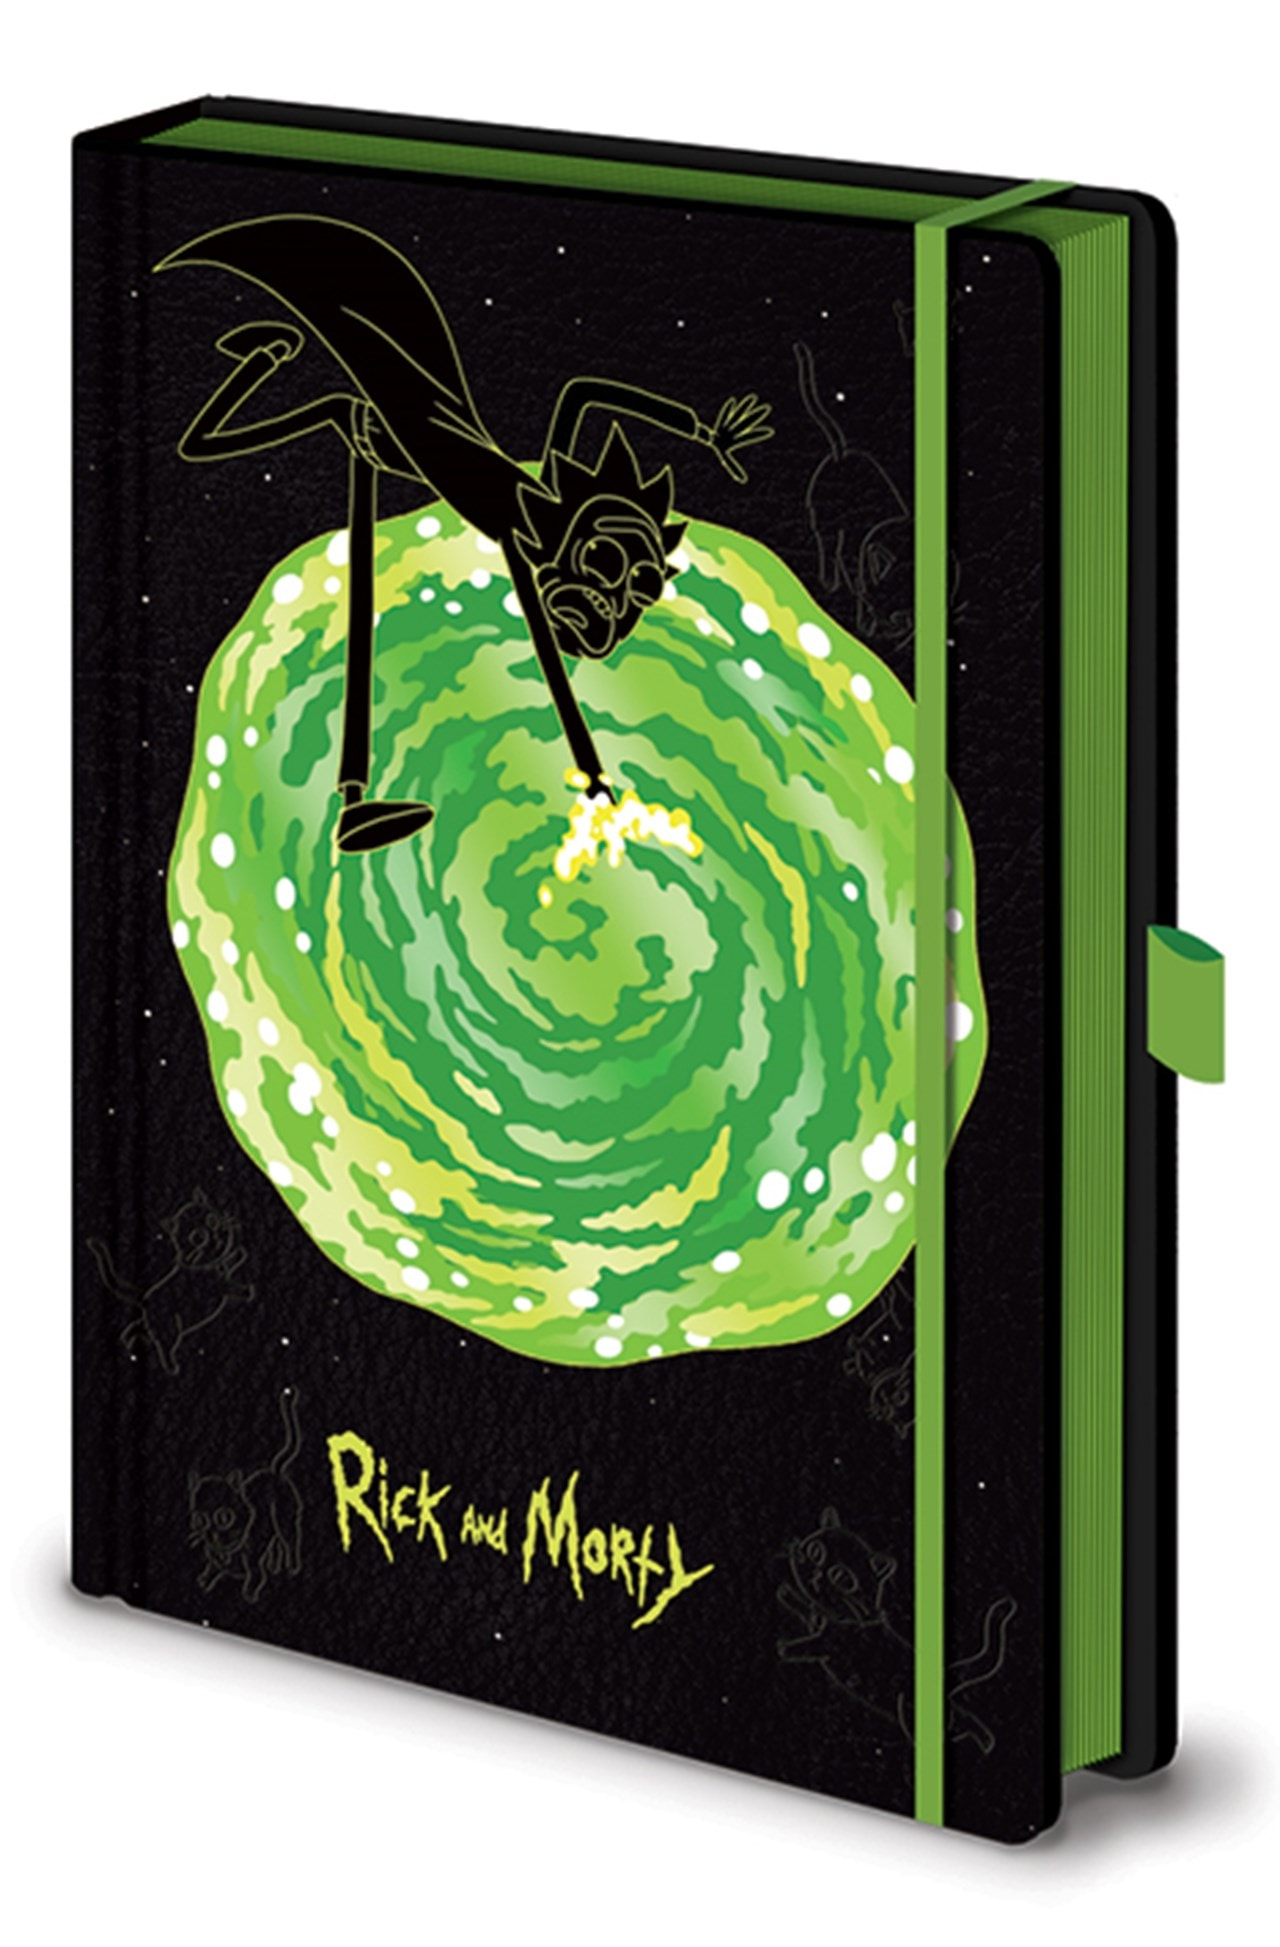 Rick and Morty Portals Notepad - 1